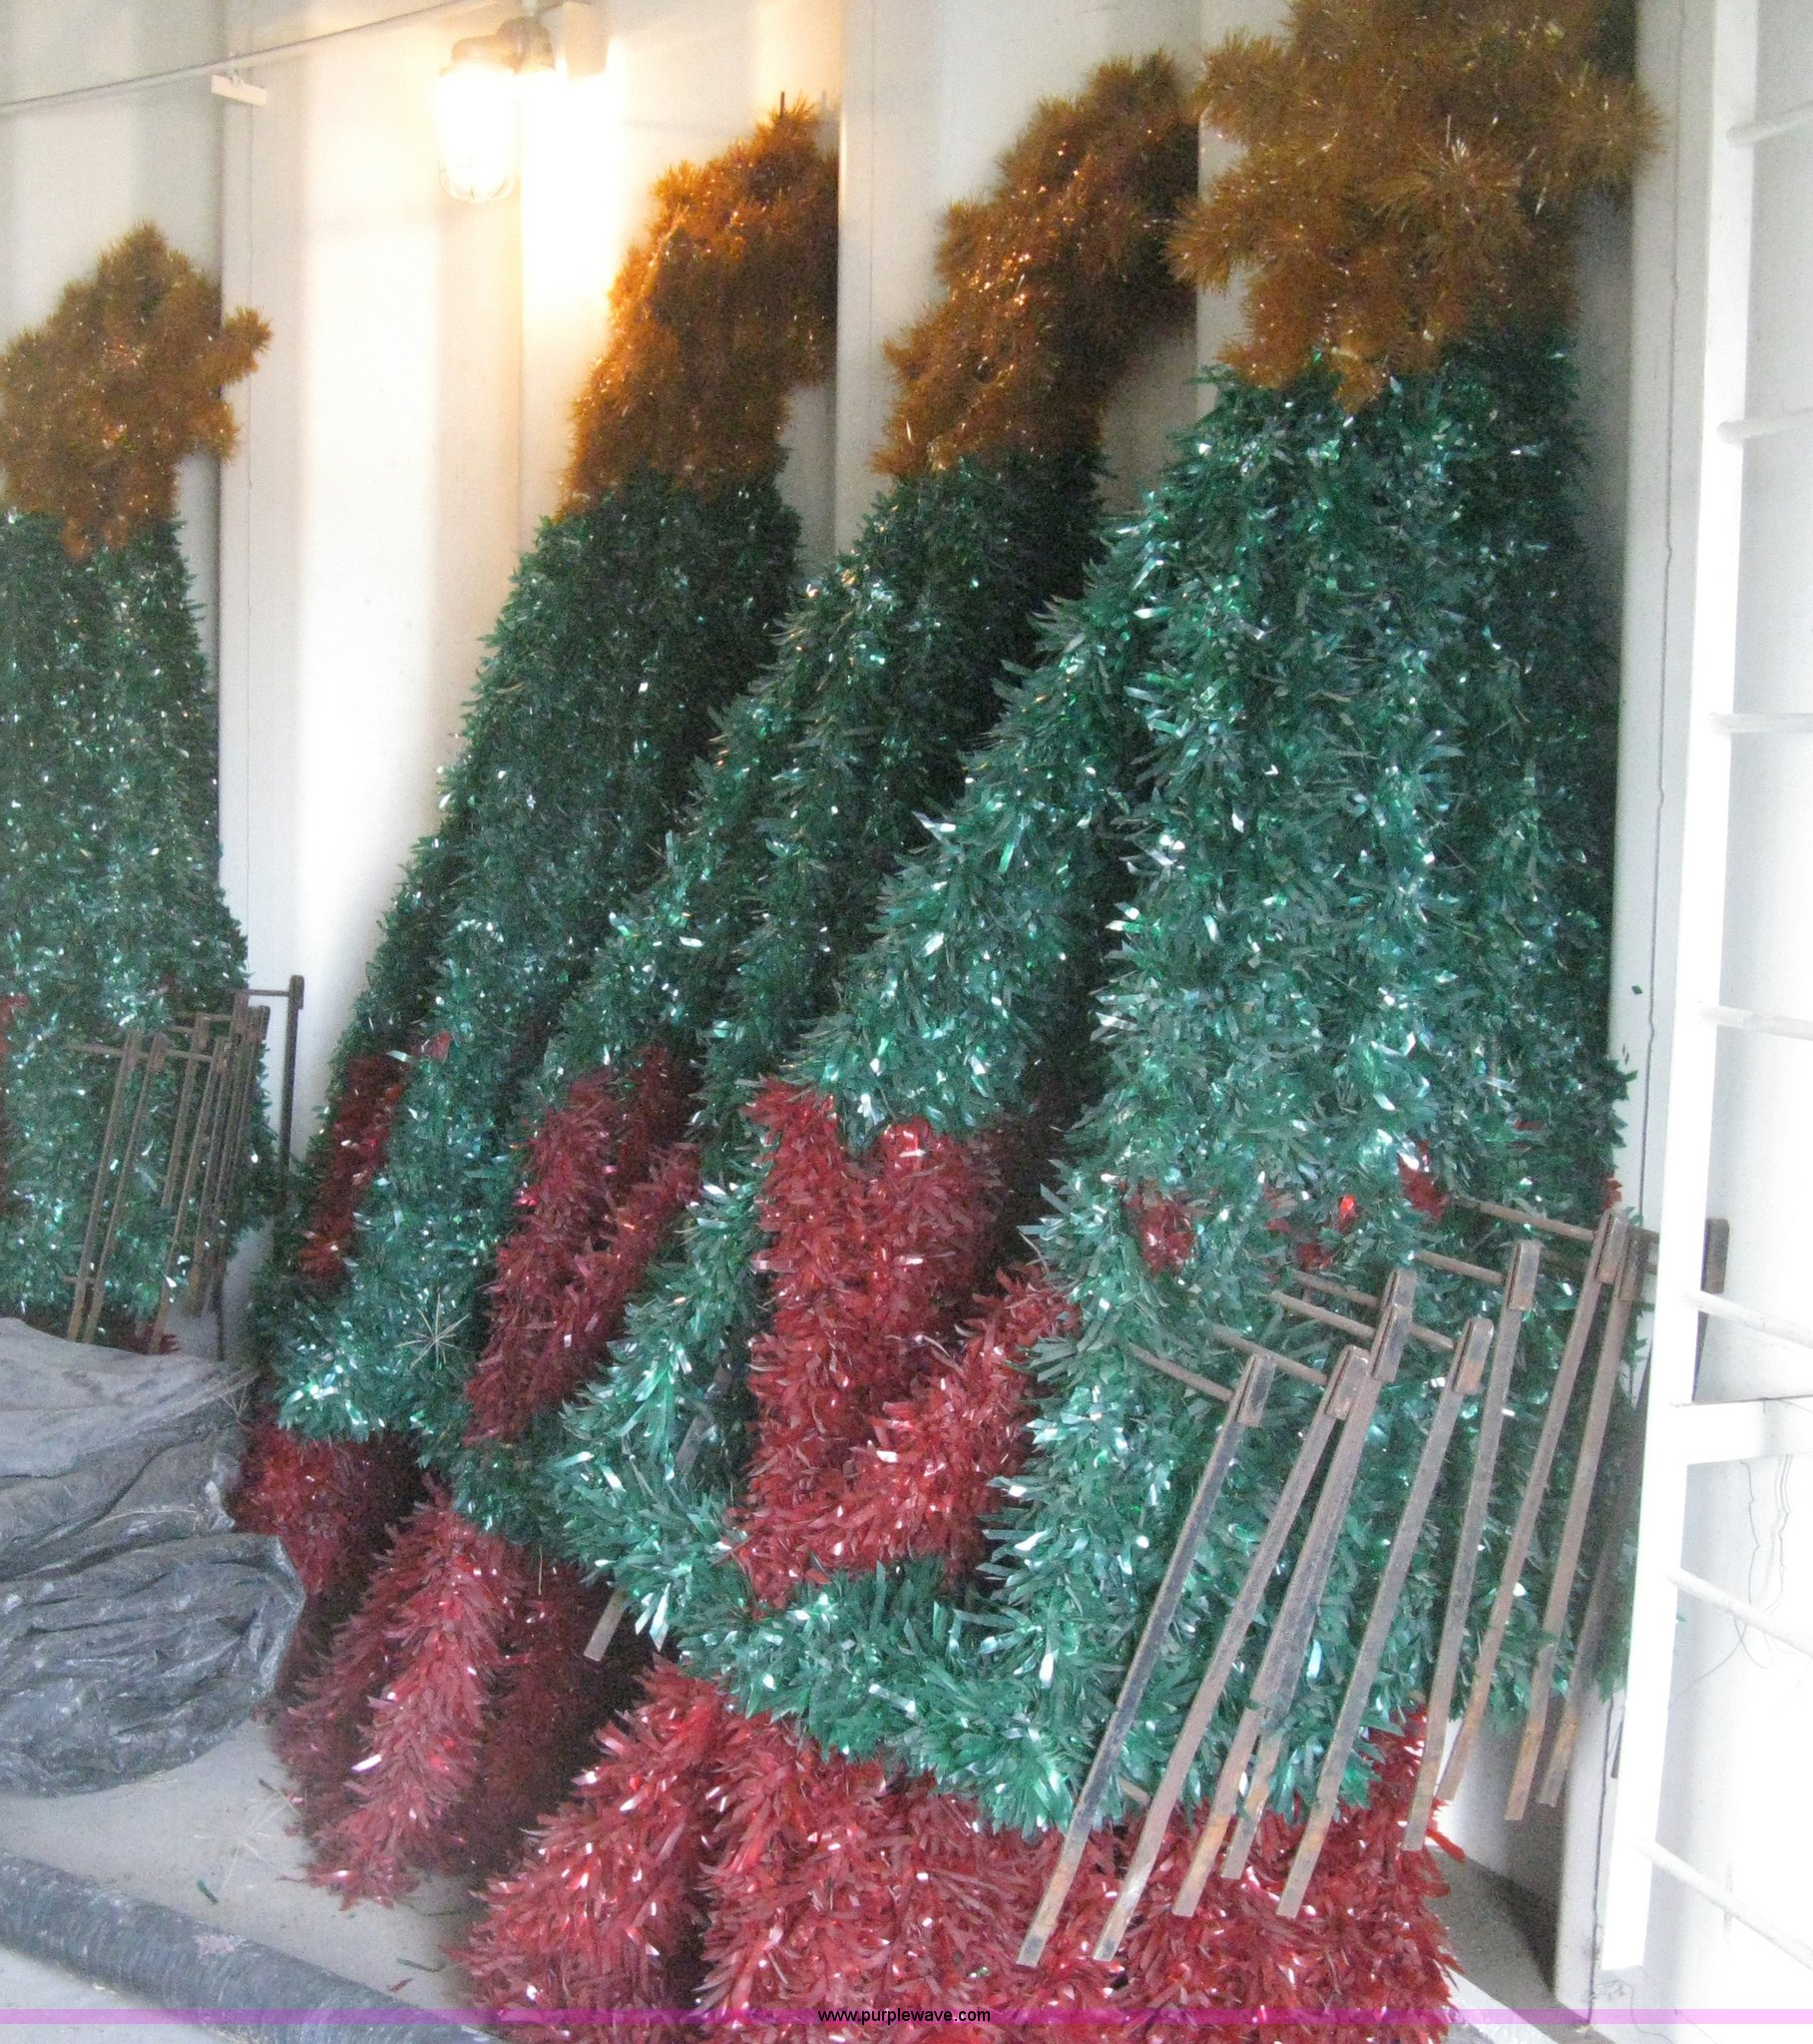 Municipal Christmas Decorations Auction